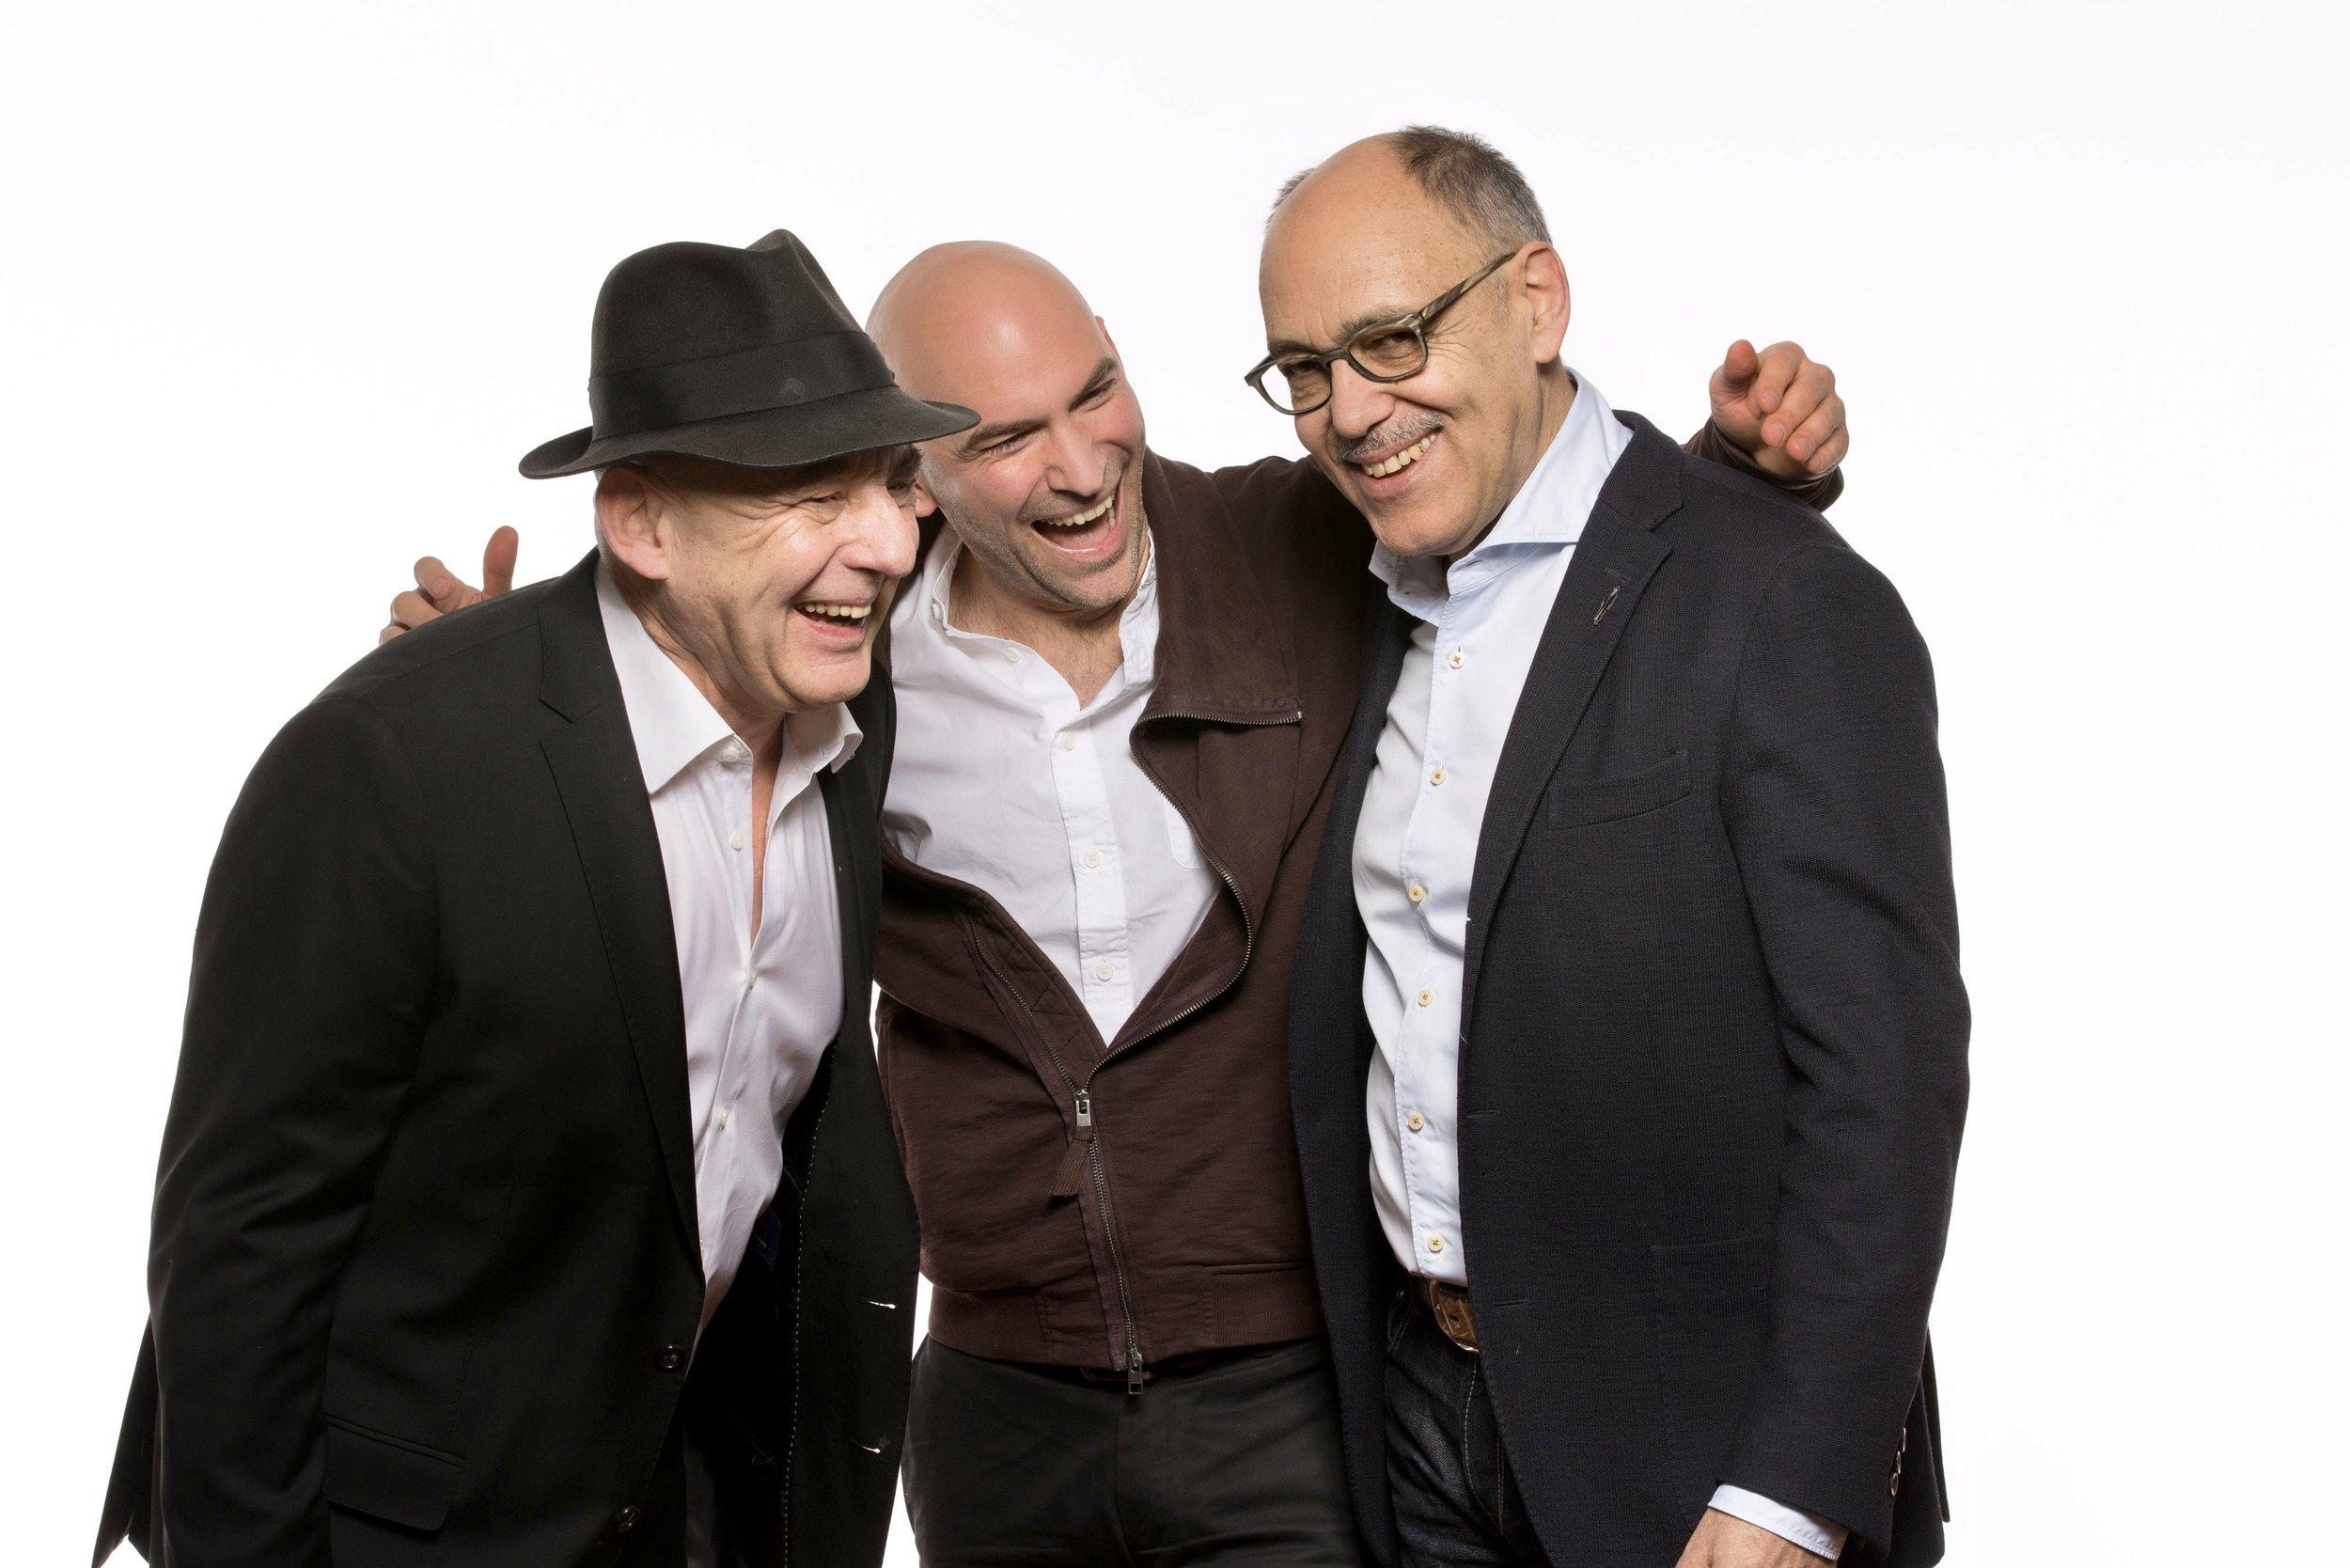 Storydealer Berlin   Heidelberg - Dr. Hans Geisslinger//Stefanos Pavlakis//Dr. Hans Rudi Fischer